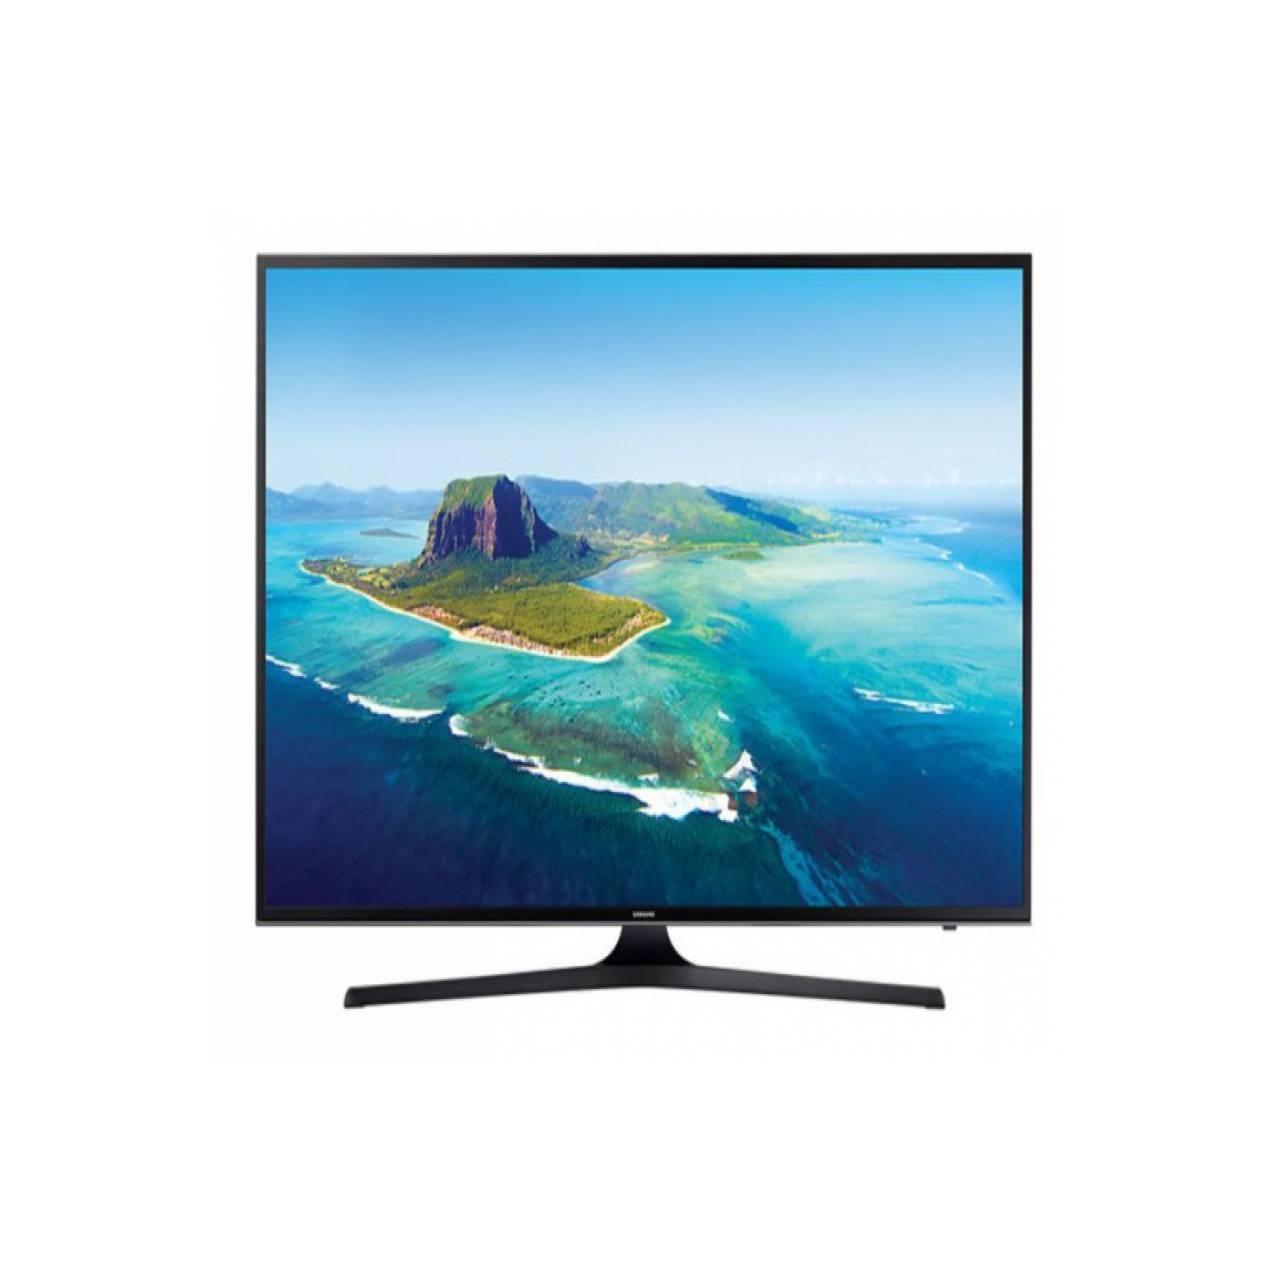 PROMO LED TV 40 INCH SAMSUNG 40KU6000 UHD 4K SMART TV MURAH